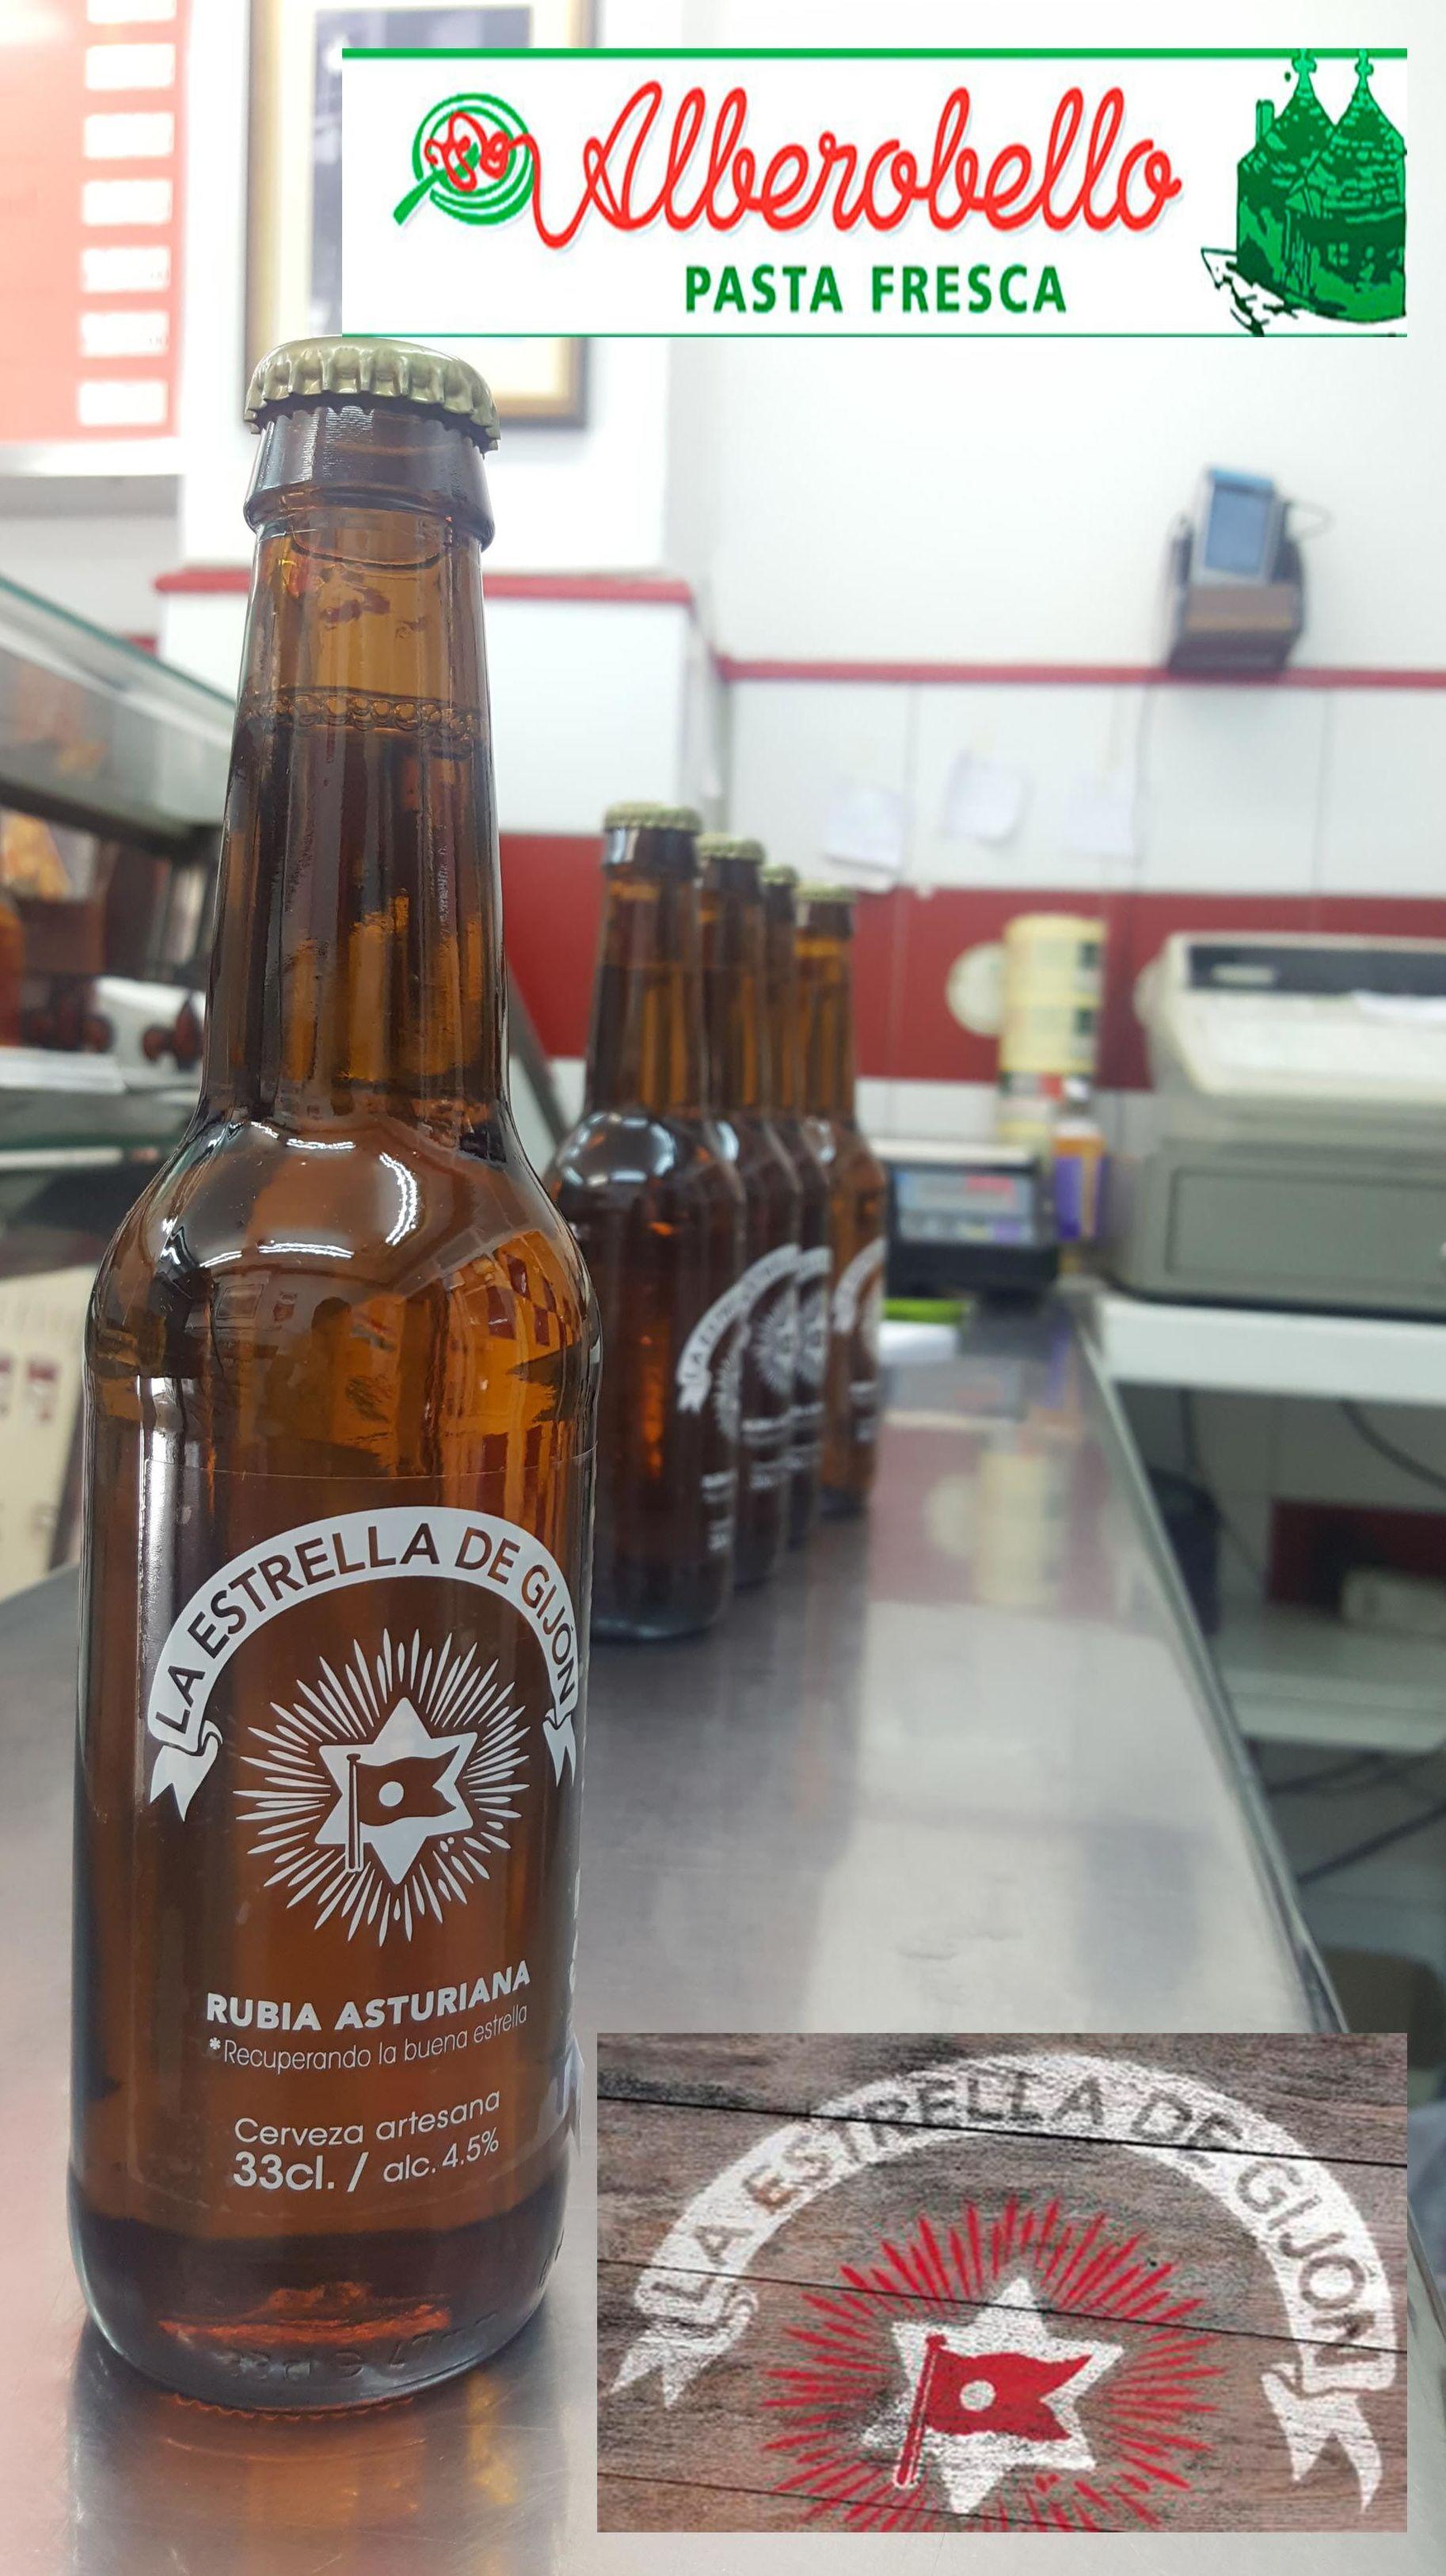 Cerveza La estrella de Gijón en alberobello